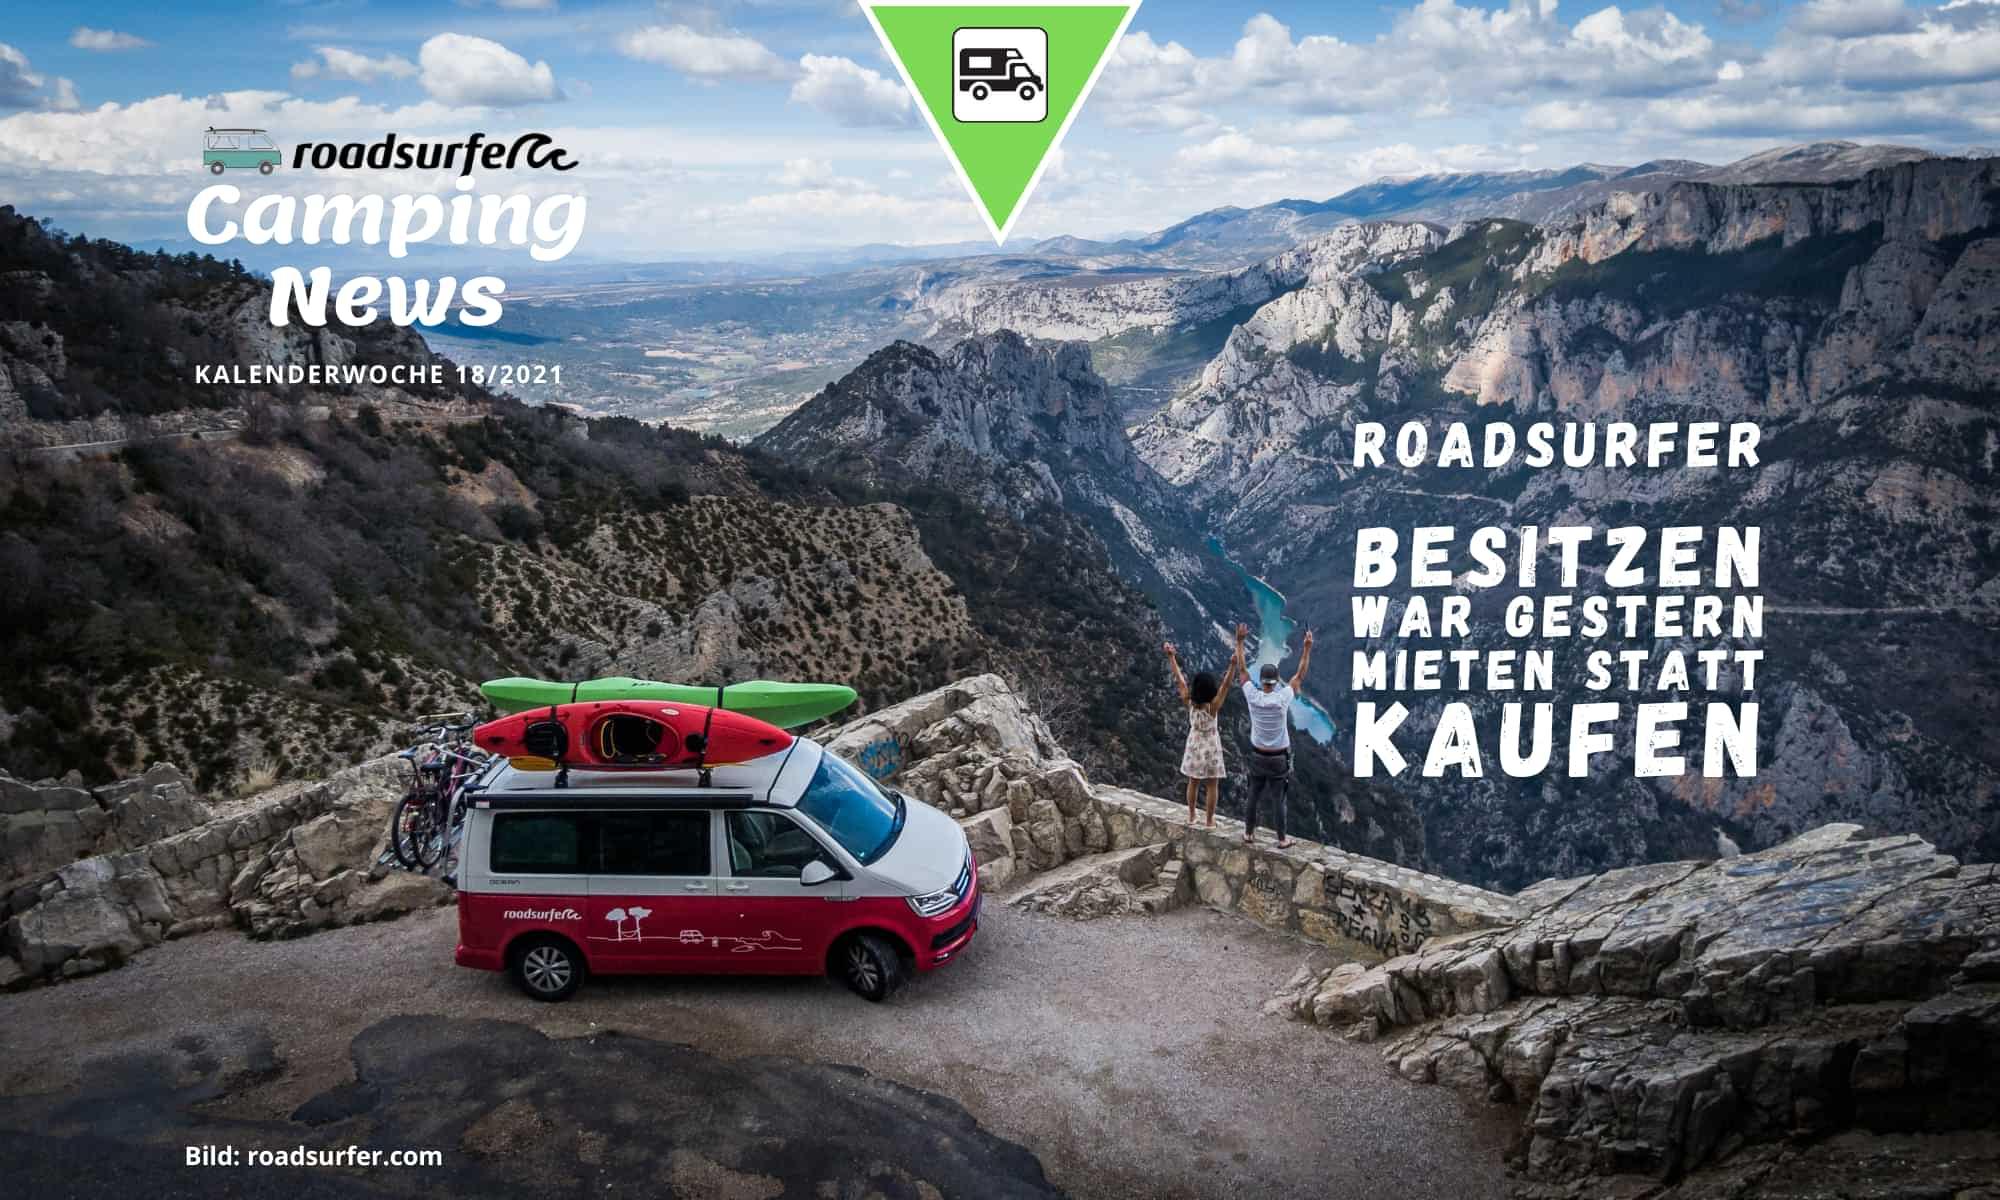 Roadsurfer Camper mieten statt kaufen